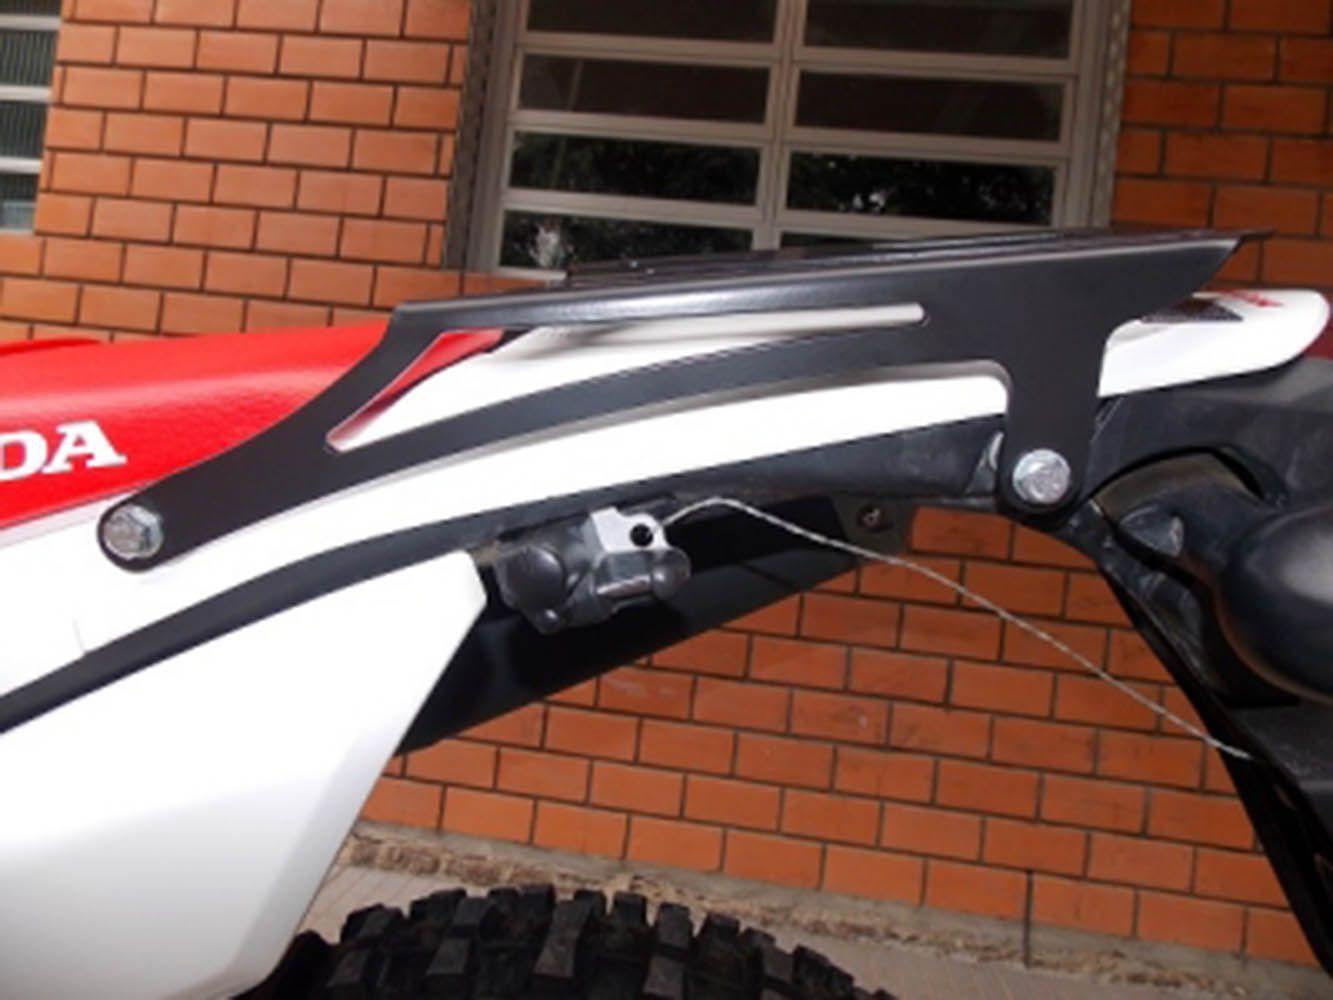 Bagageiro Chapa Bauleto Crf 250 L 2012 Preto Fosco 3331